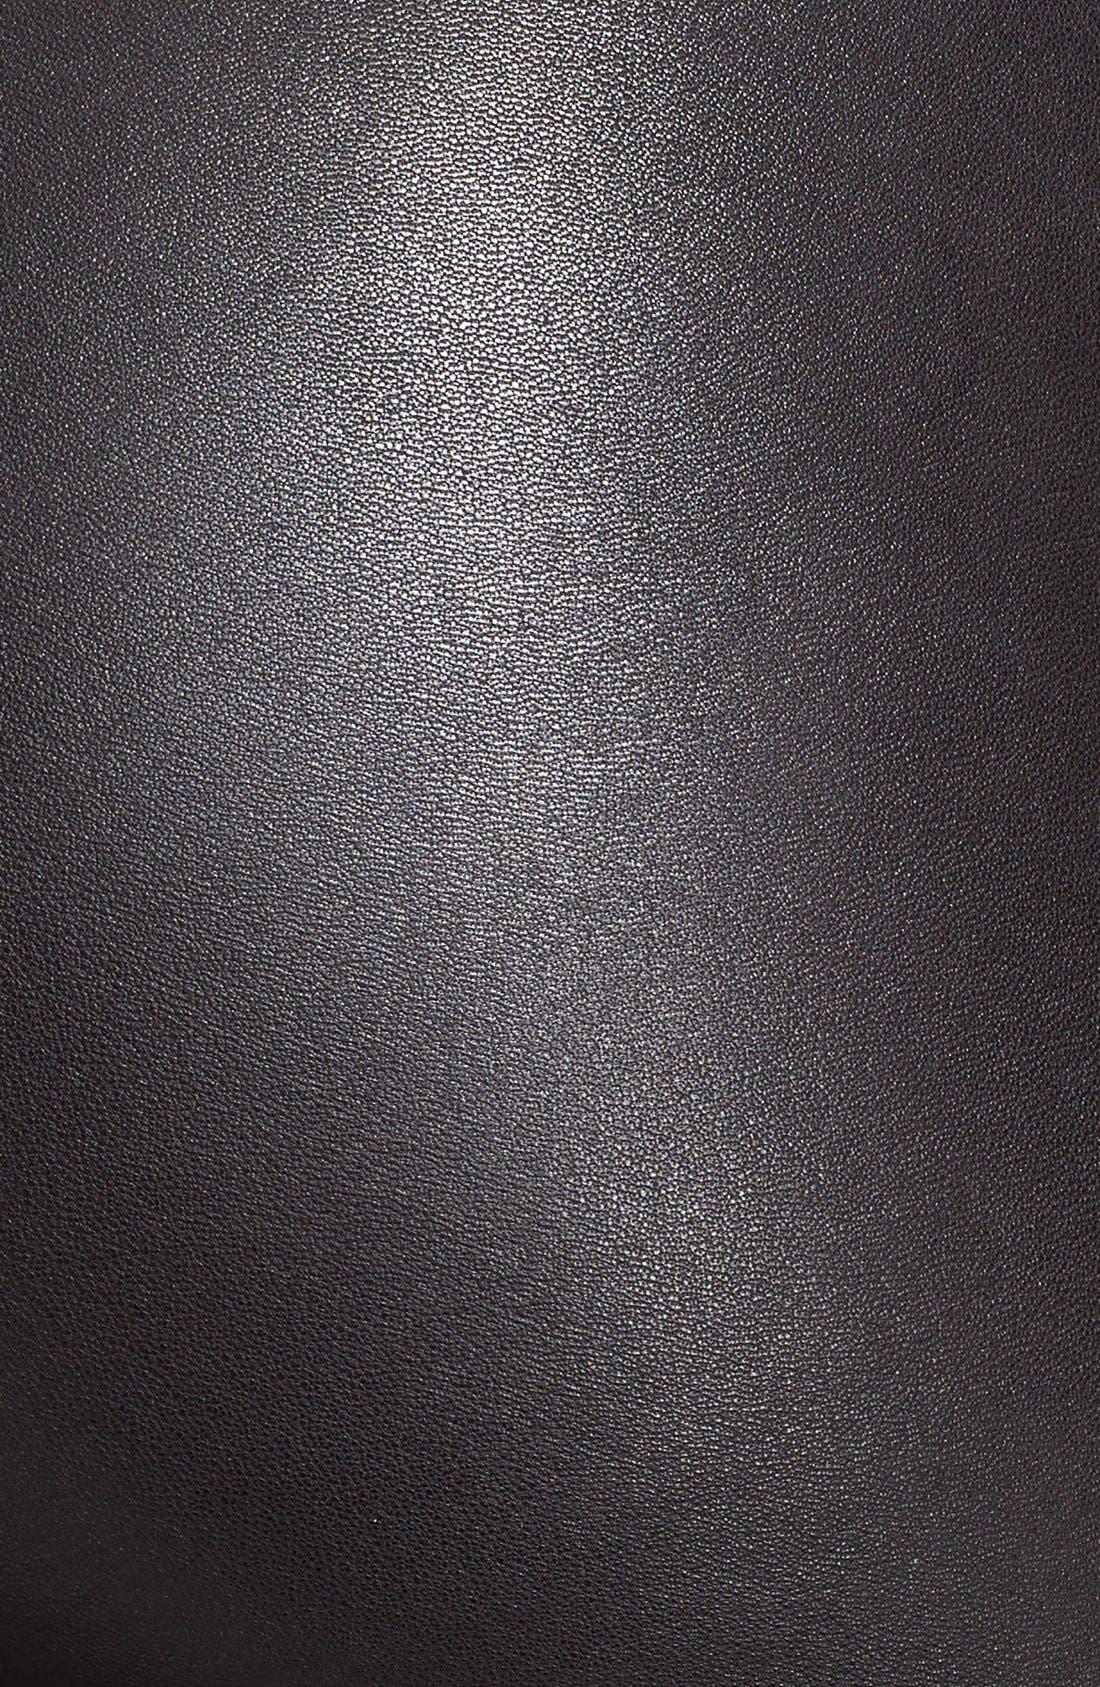 Leather Leggings,                             Alternate thumbnail 11, color,                             BLACK